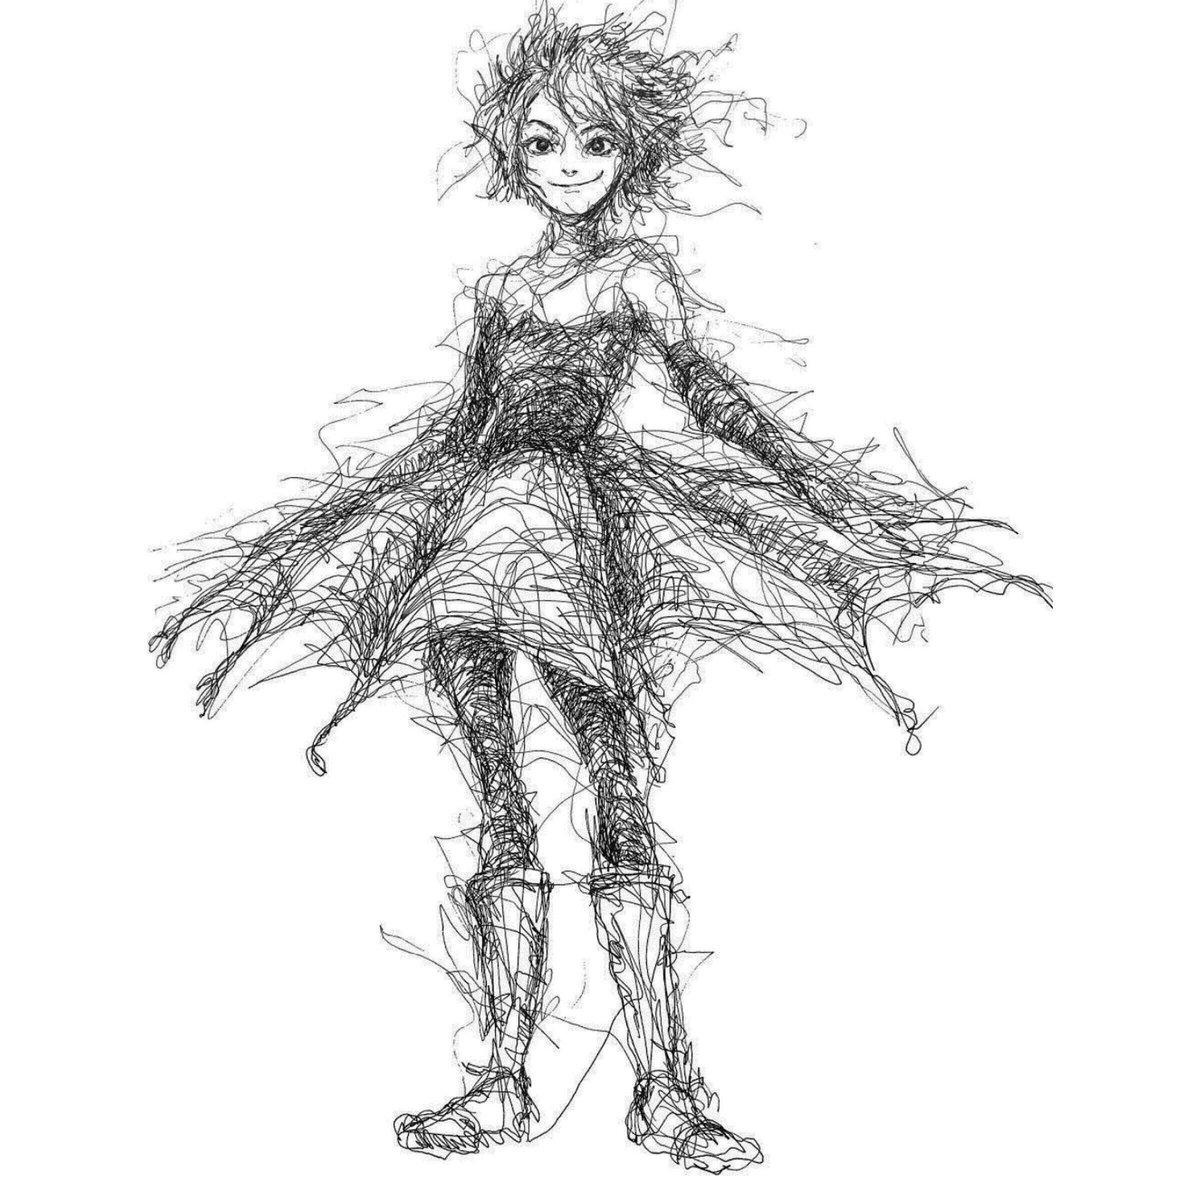 Scribbles, drawn by Hana Hwang